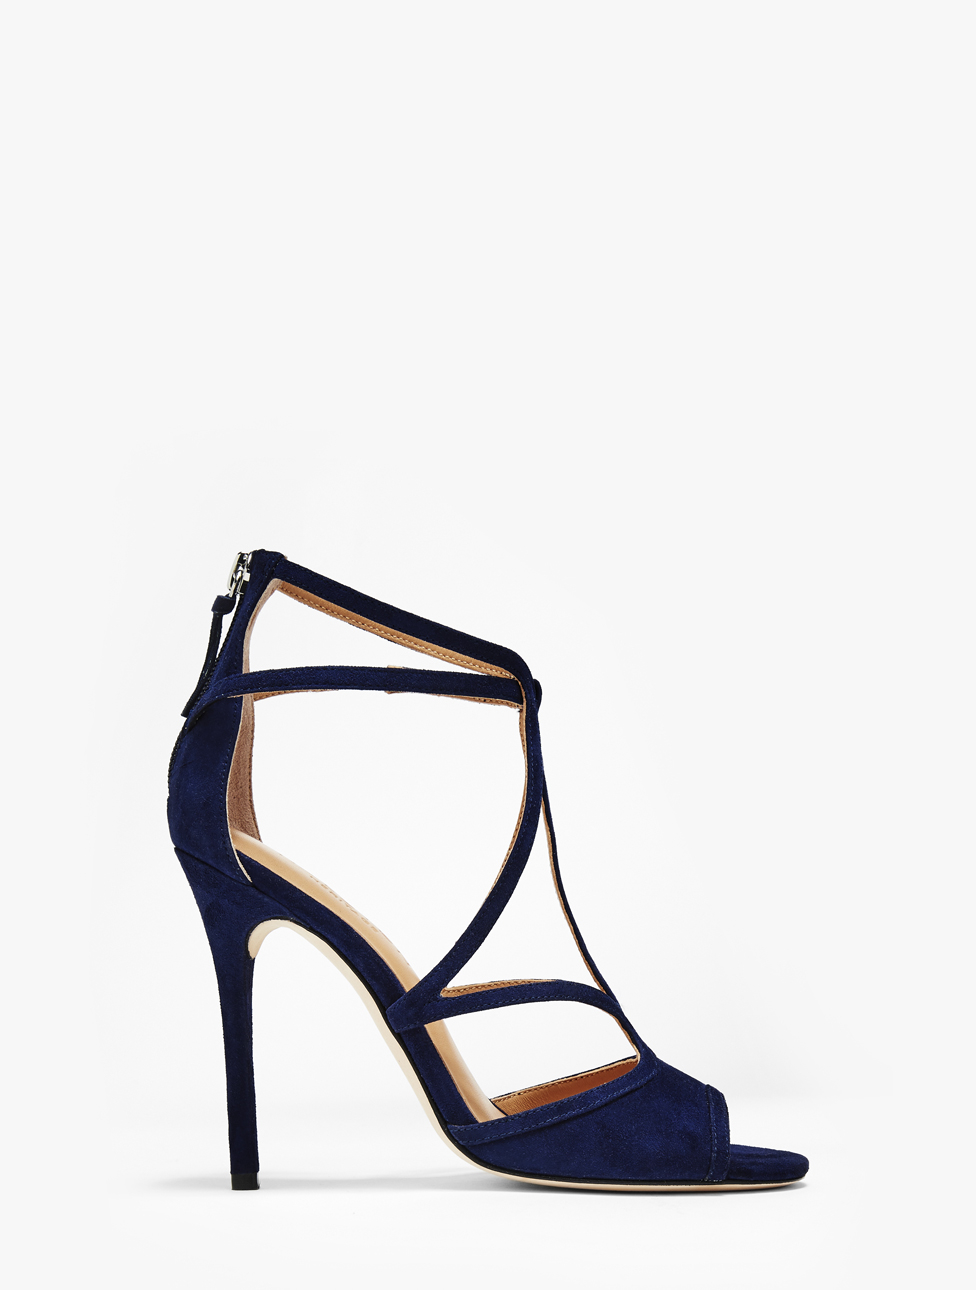 Lyst - Halston Monica Leather High Heel Sandal in Black